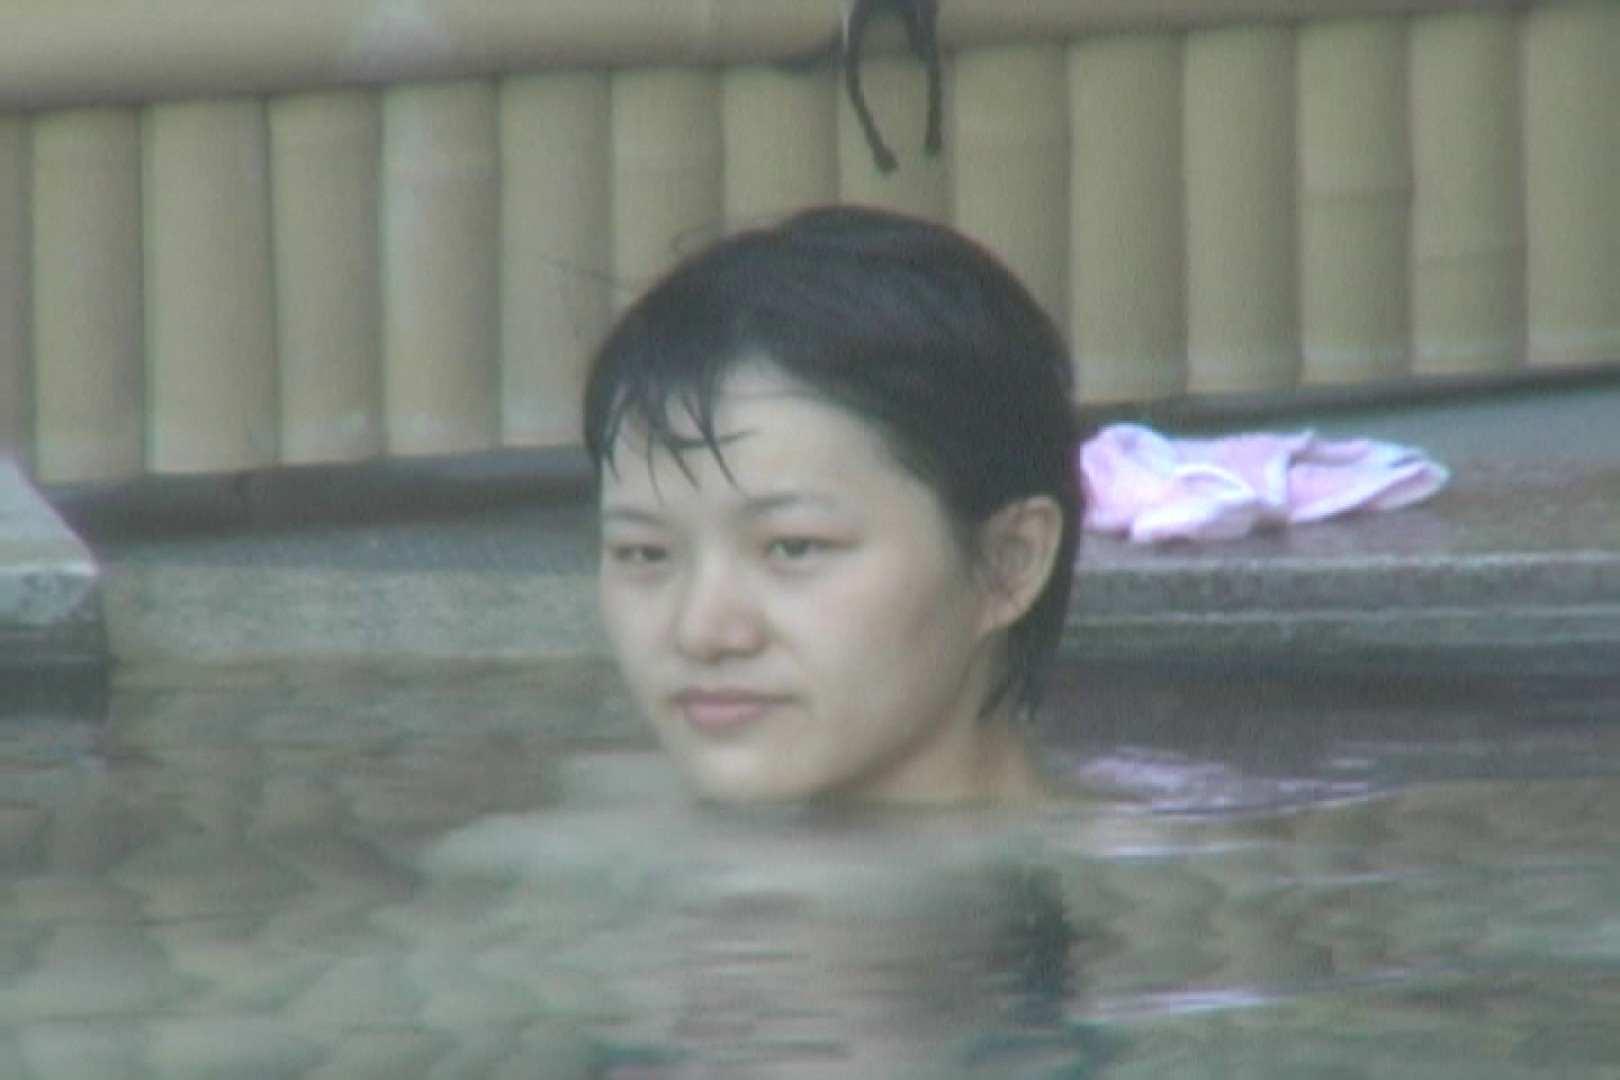 Aquaな露天風呂Vol.116 盗撮映像  42Pix 25